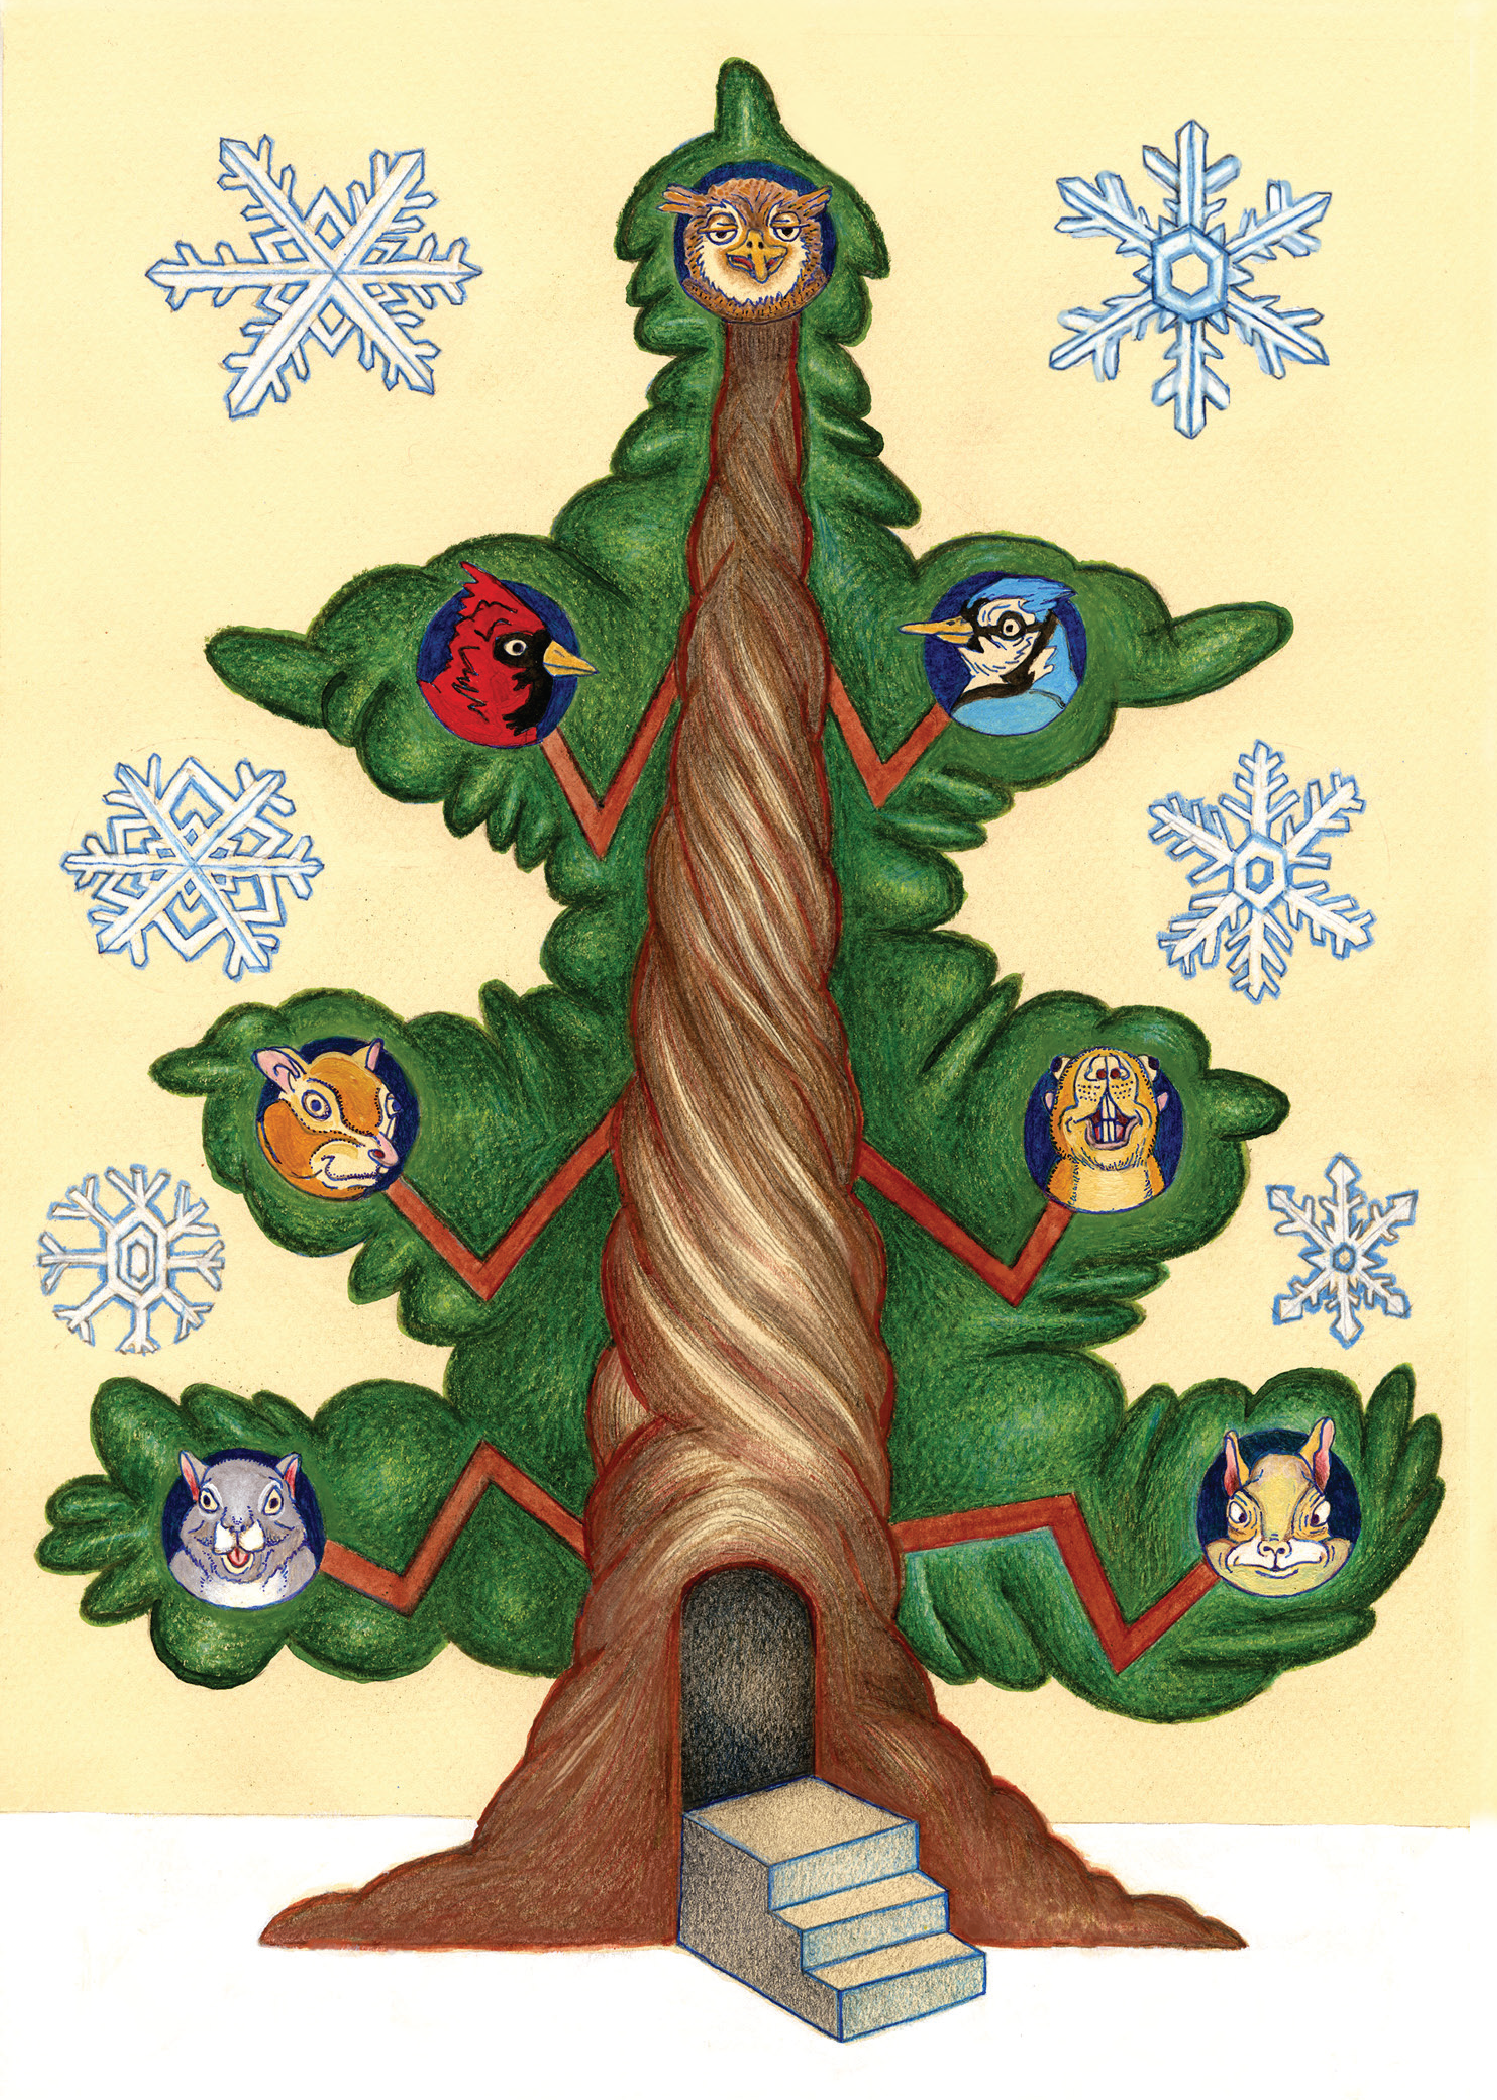 2017-Christmas Card Jason Herr.png